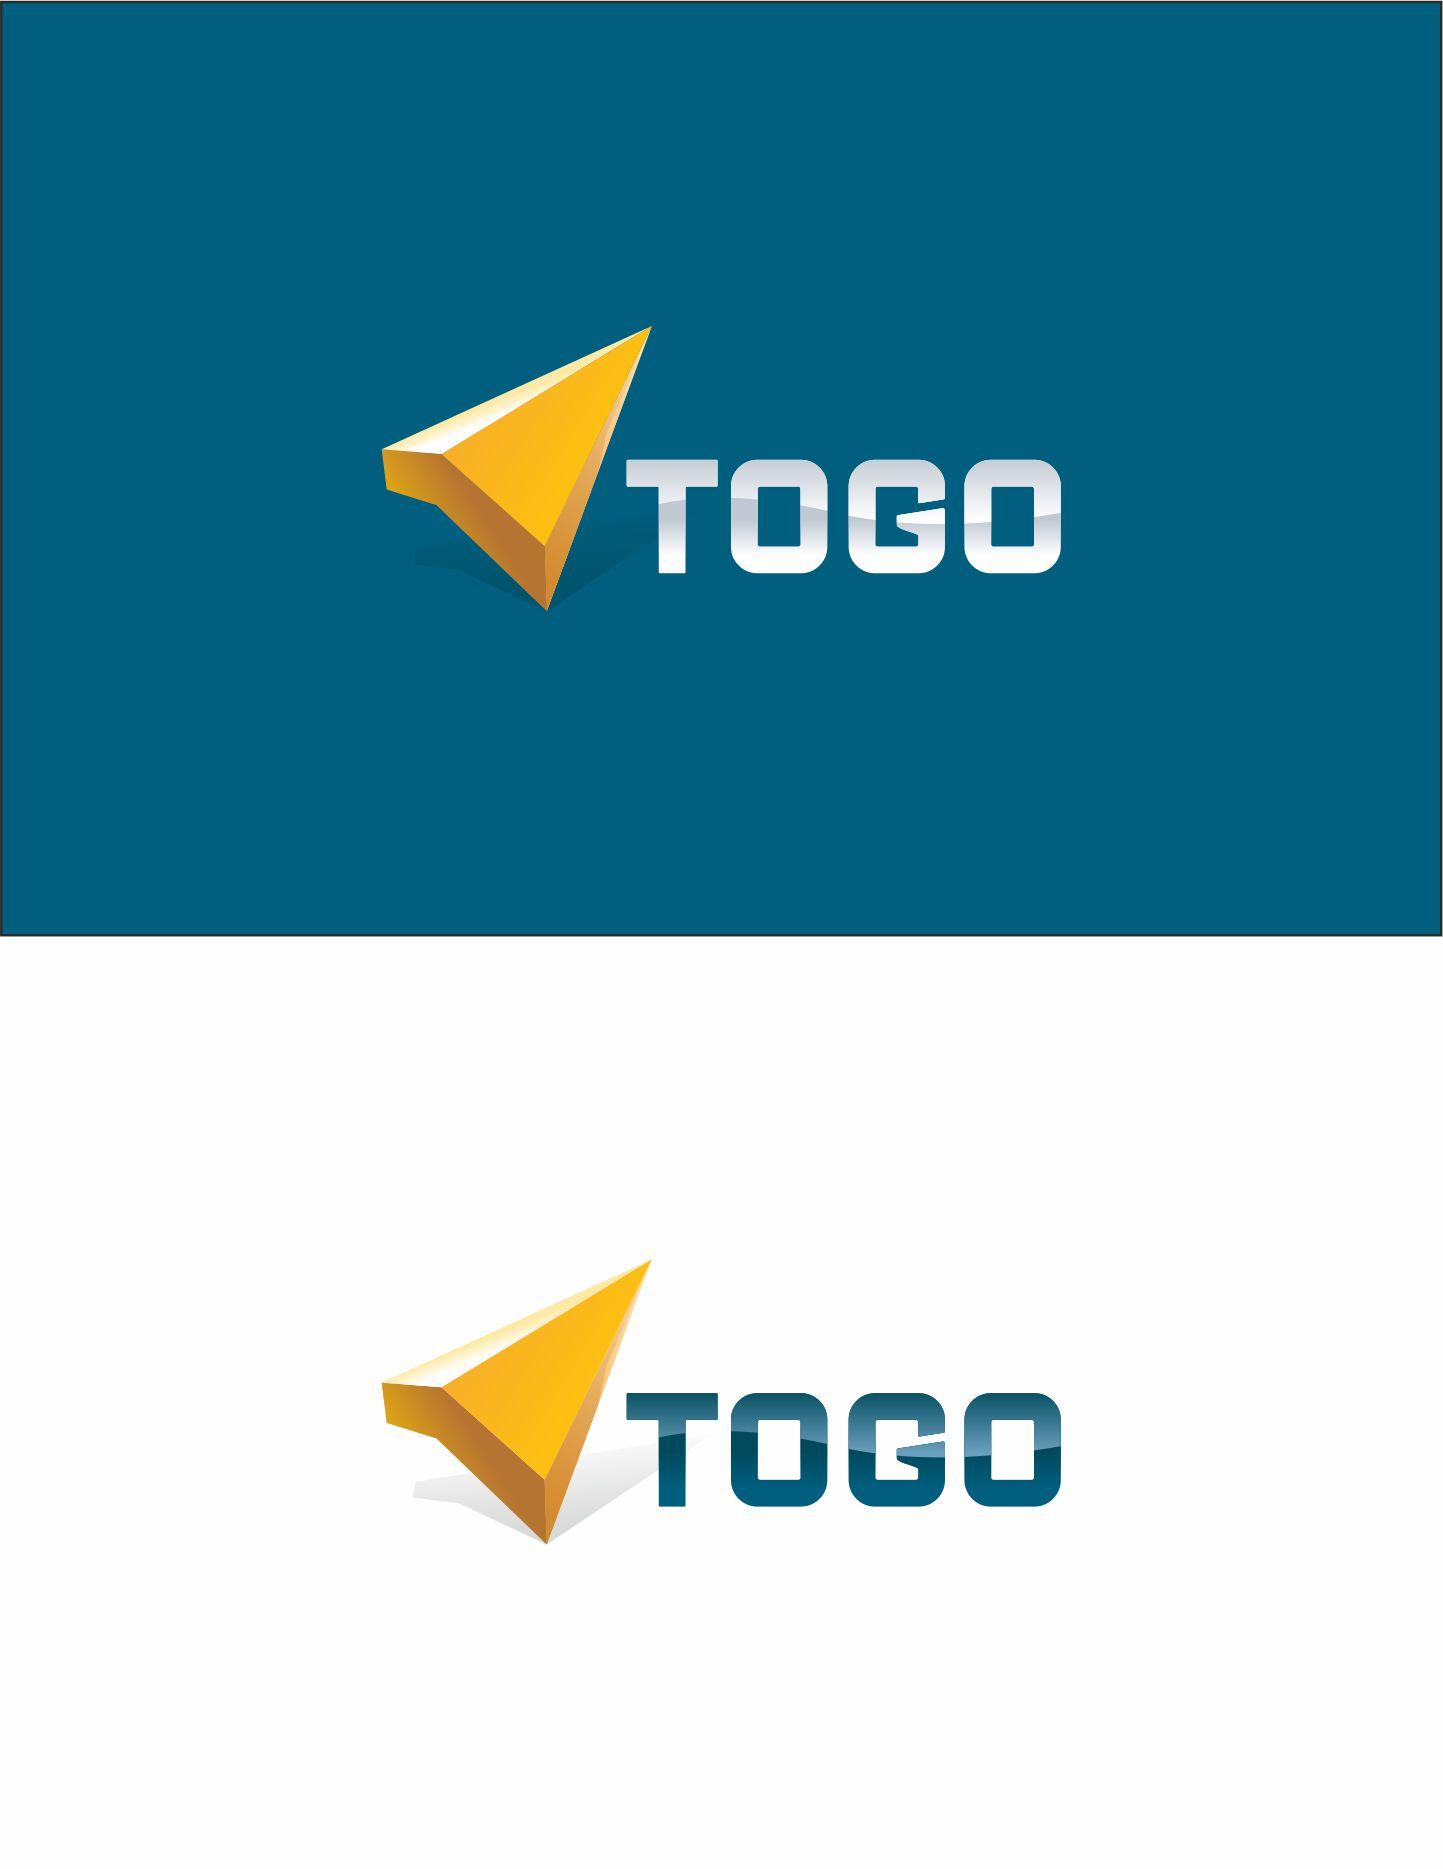 Разработать логотип и экран загрузки приложения фото f_0615aa923c155eb3.jpg